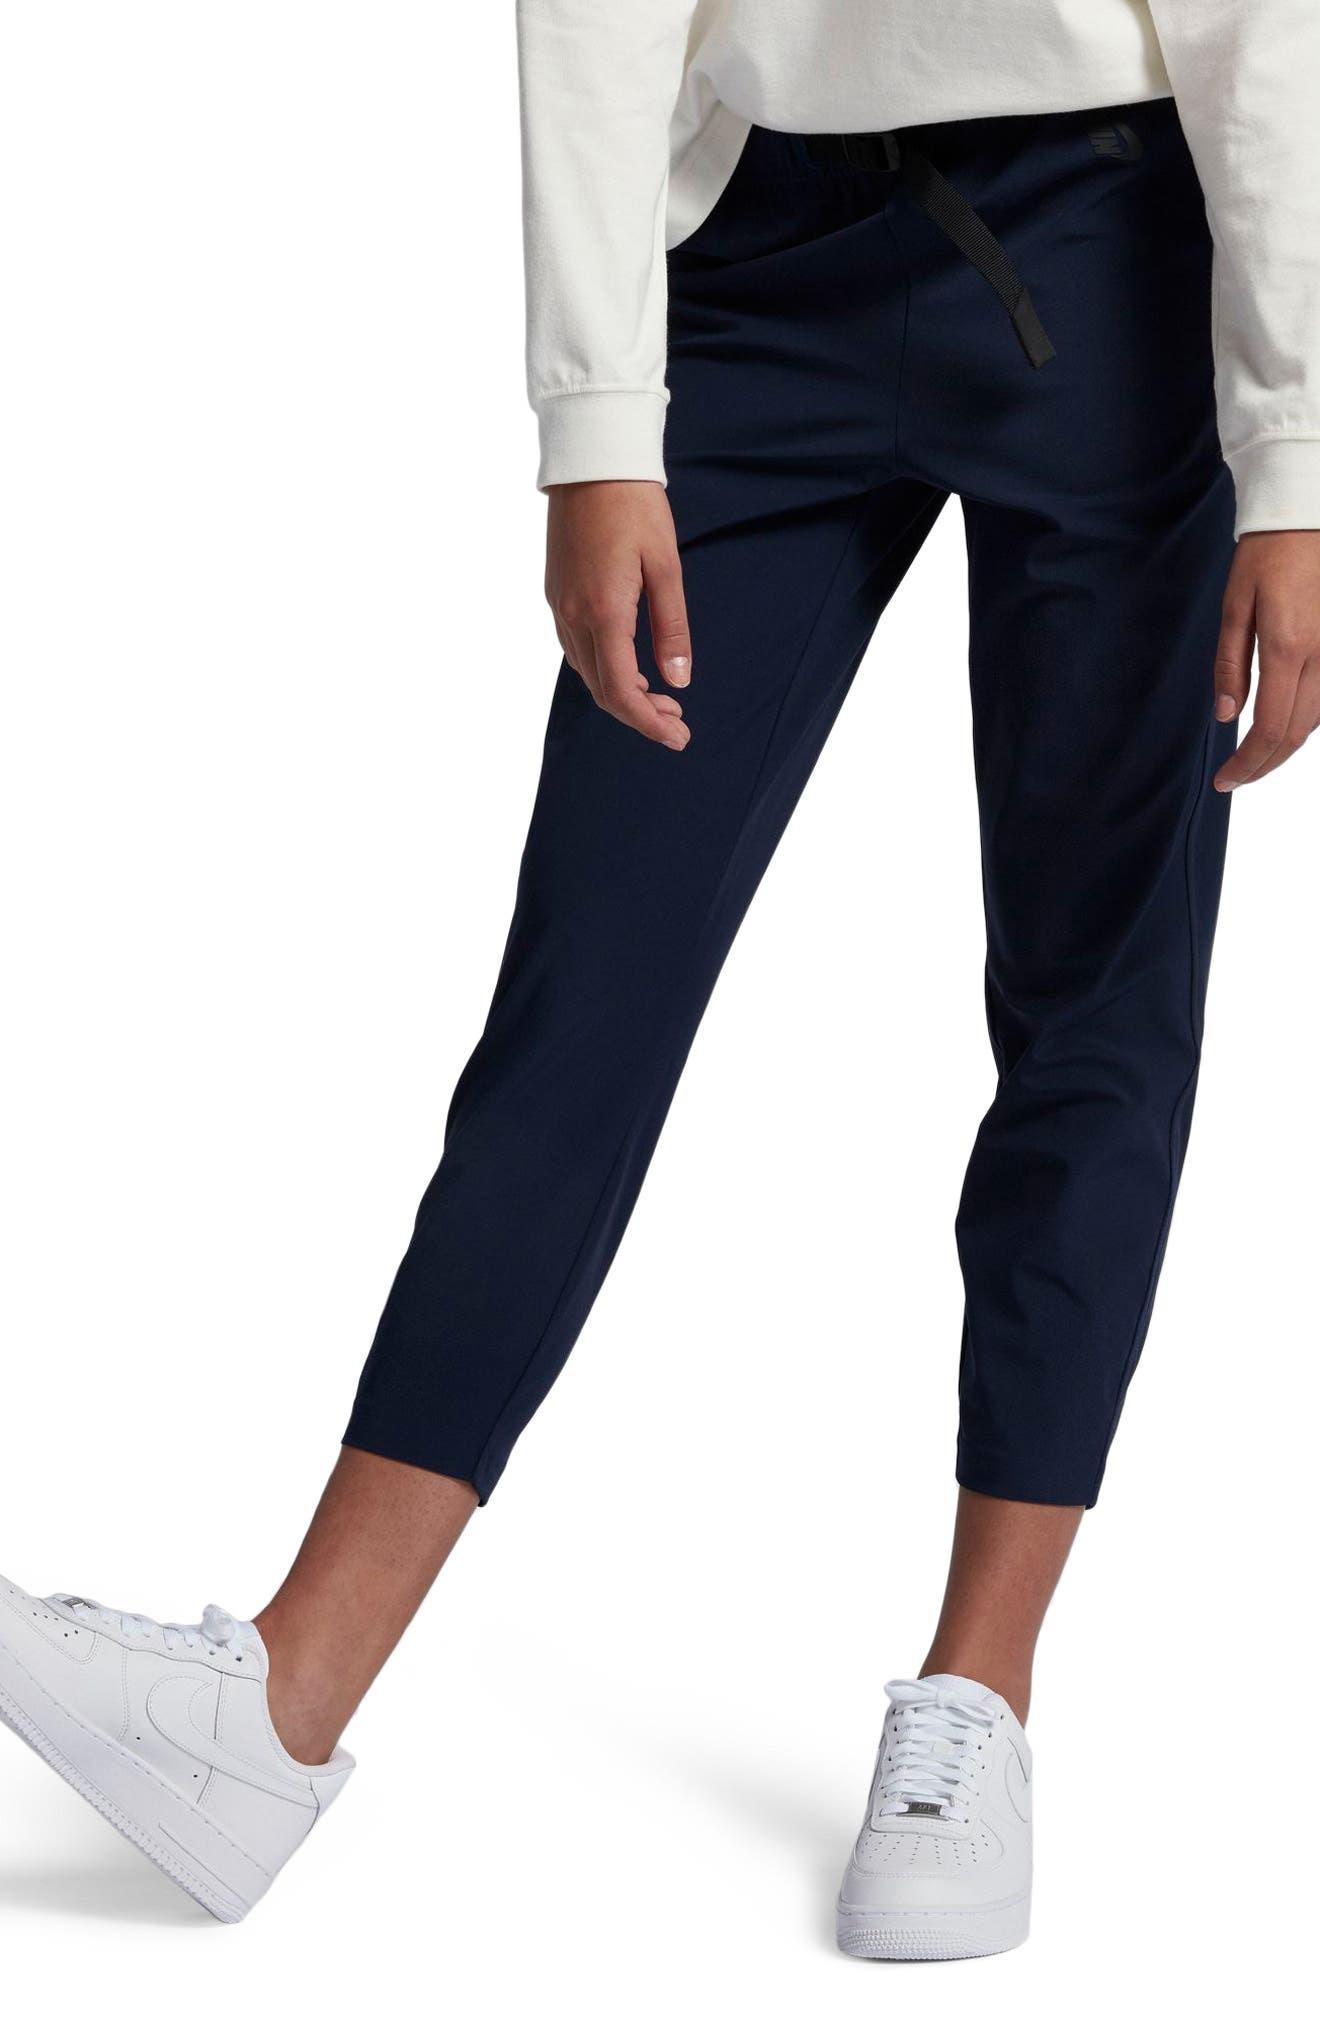 Main Image - Nike NikeLab Essentials Women's Stretch Woven Pants